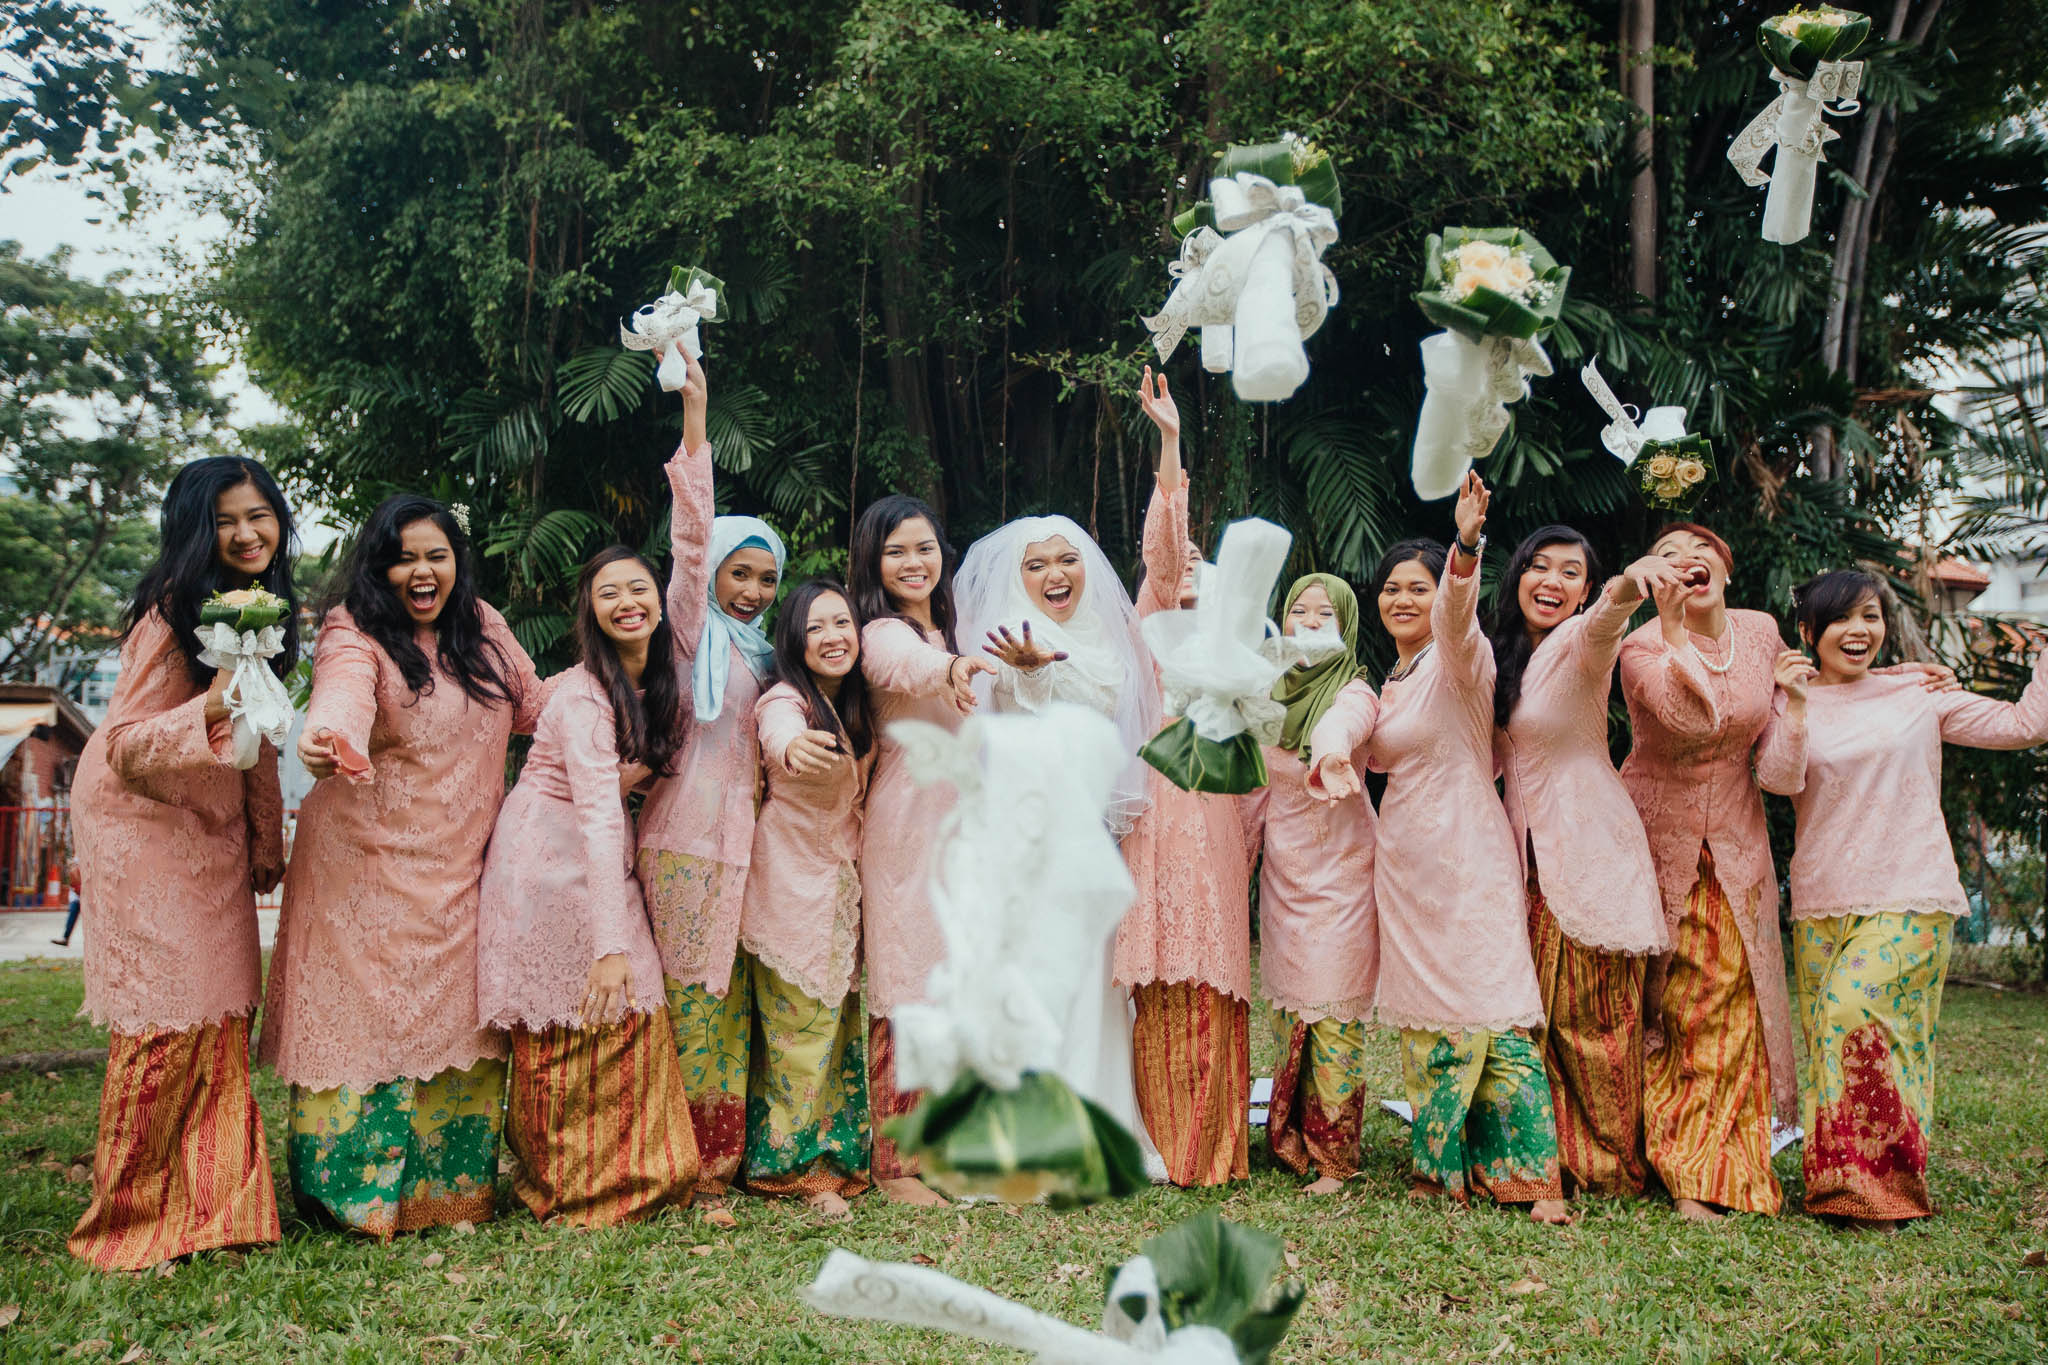 singapore-wedding-photographer-malay-indian-pre-wedding-travel-wmt-2015-24.jpg